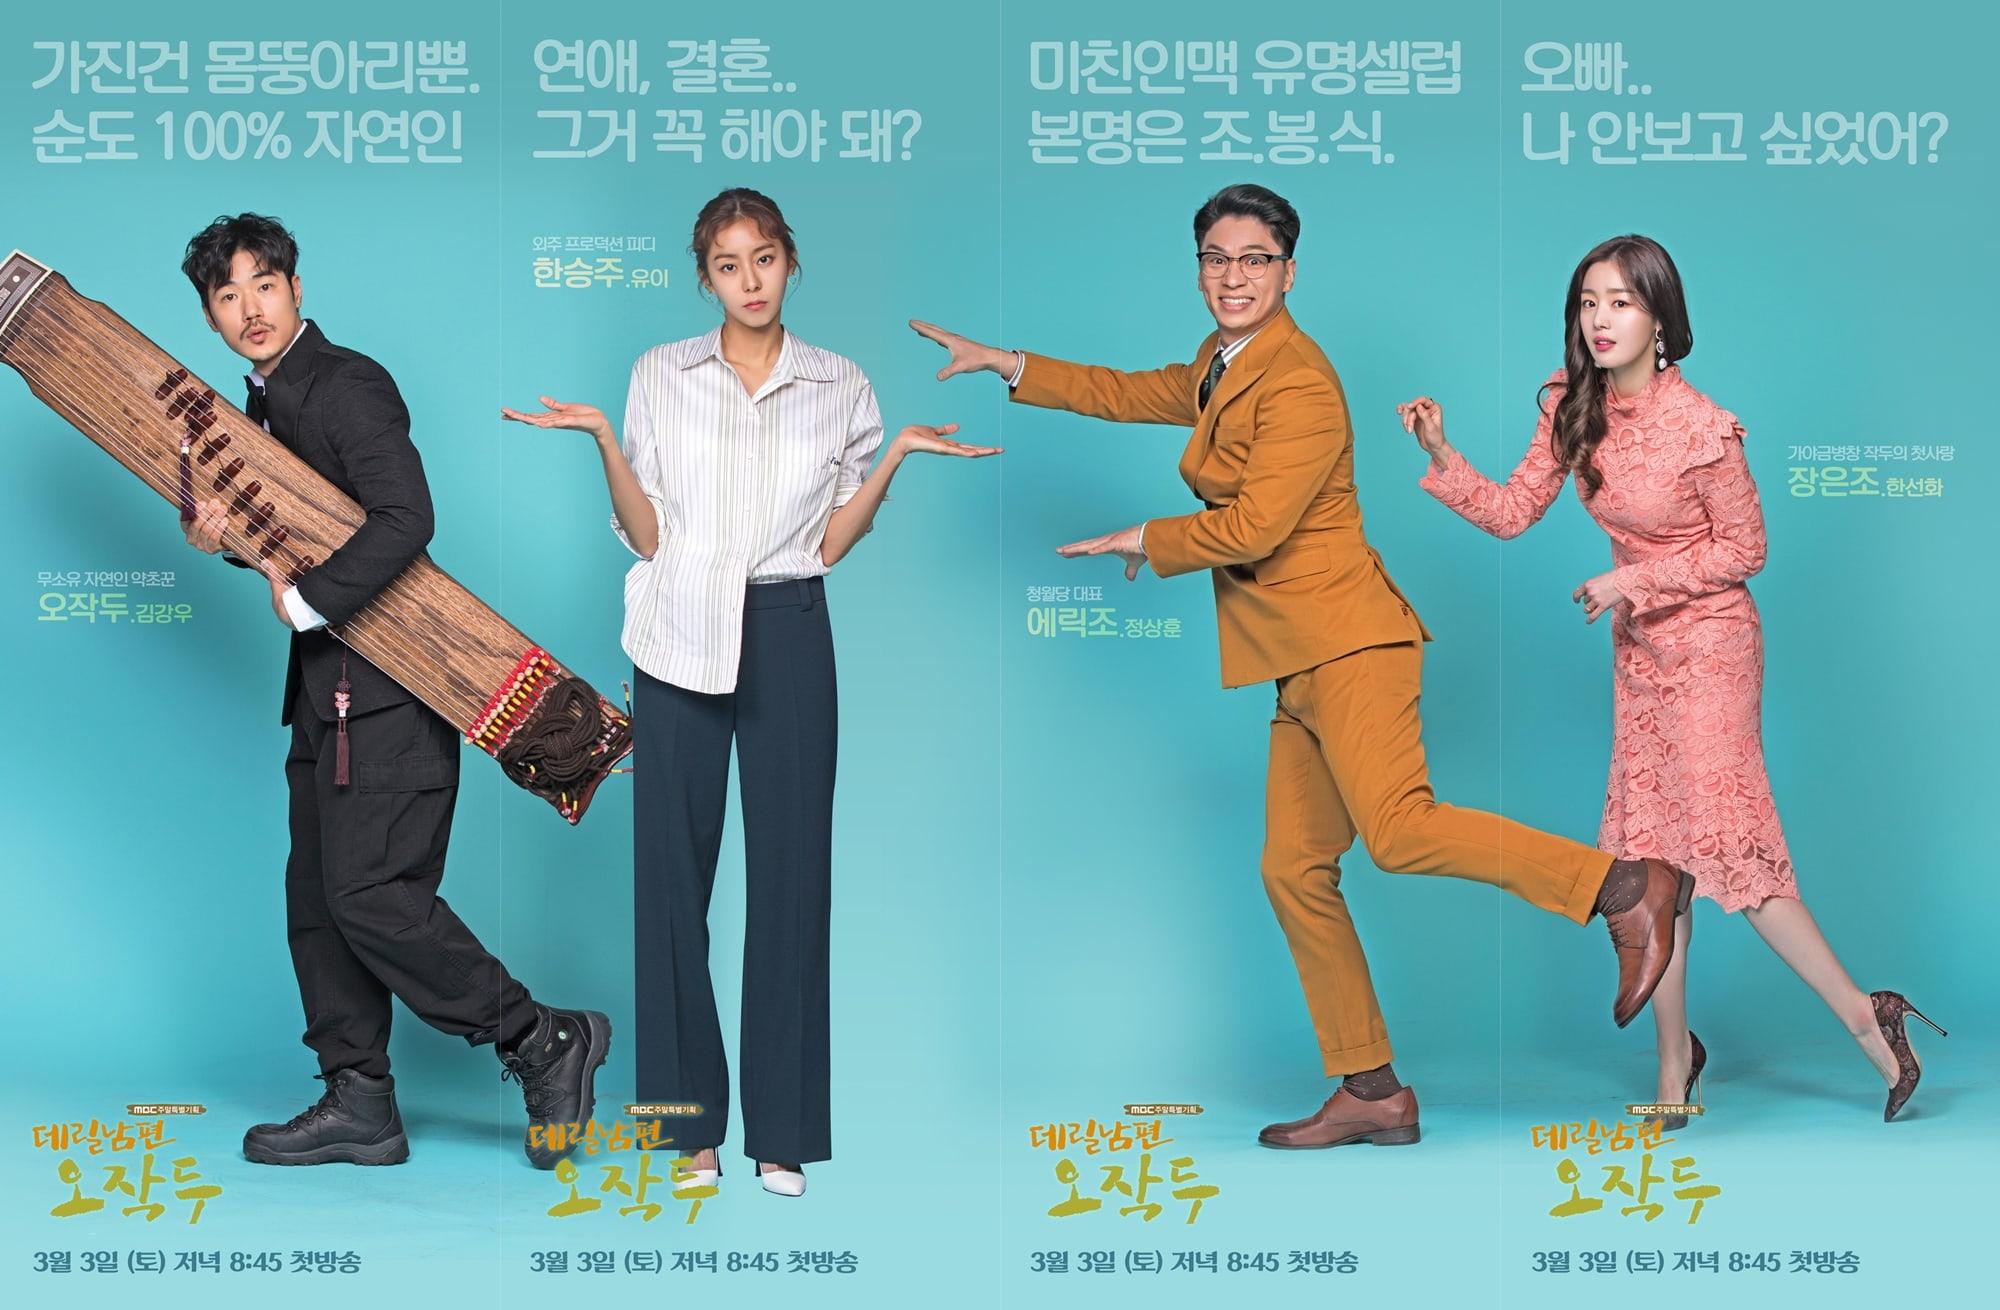 """My Husband, Mr. Oh!"" Reveals Character Posters For UEE, Kim Kang Woo, Jung Sang Hoon, And Han Sun Hwa"